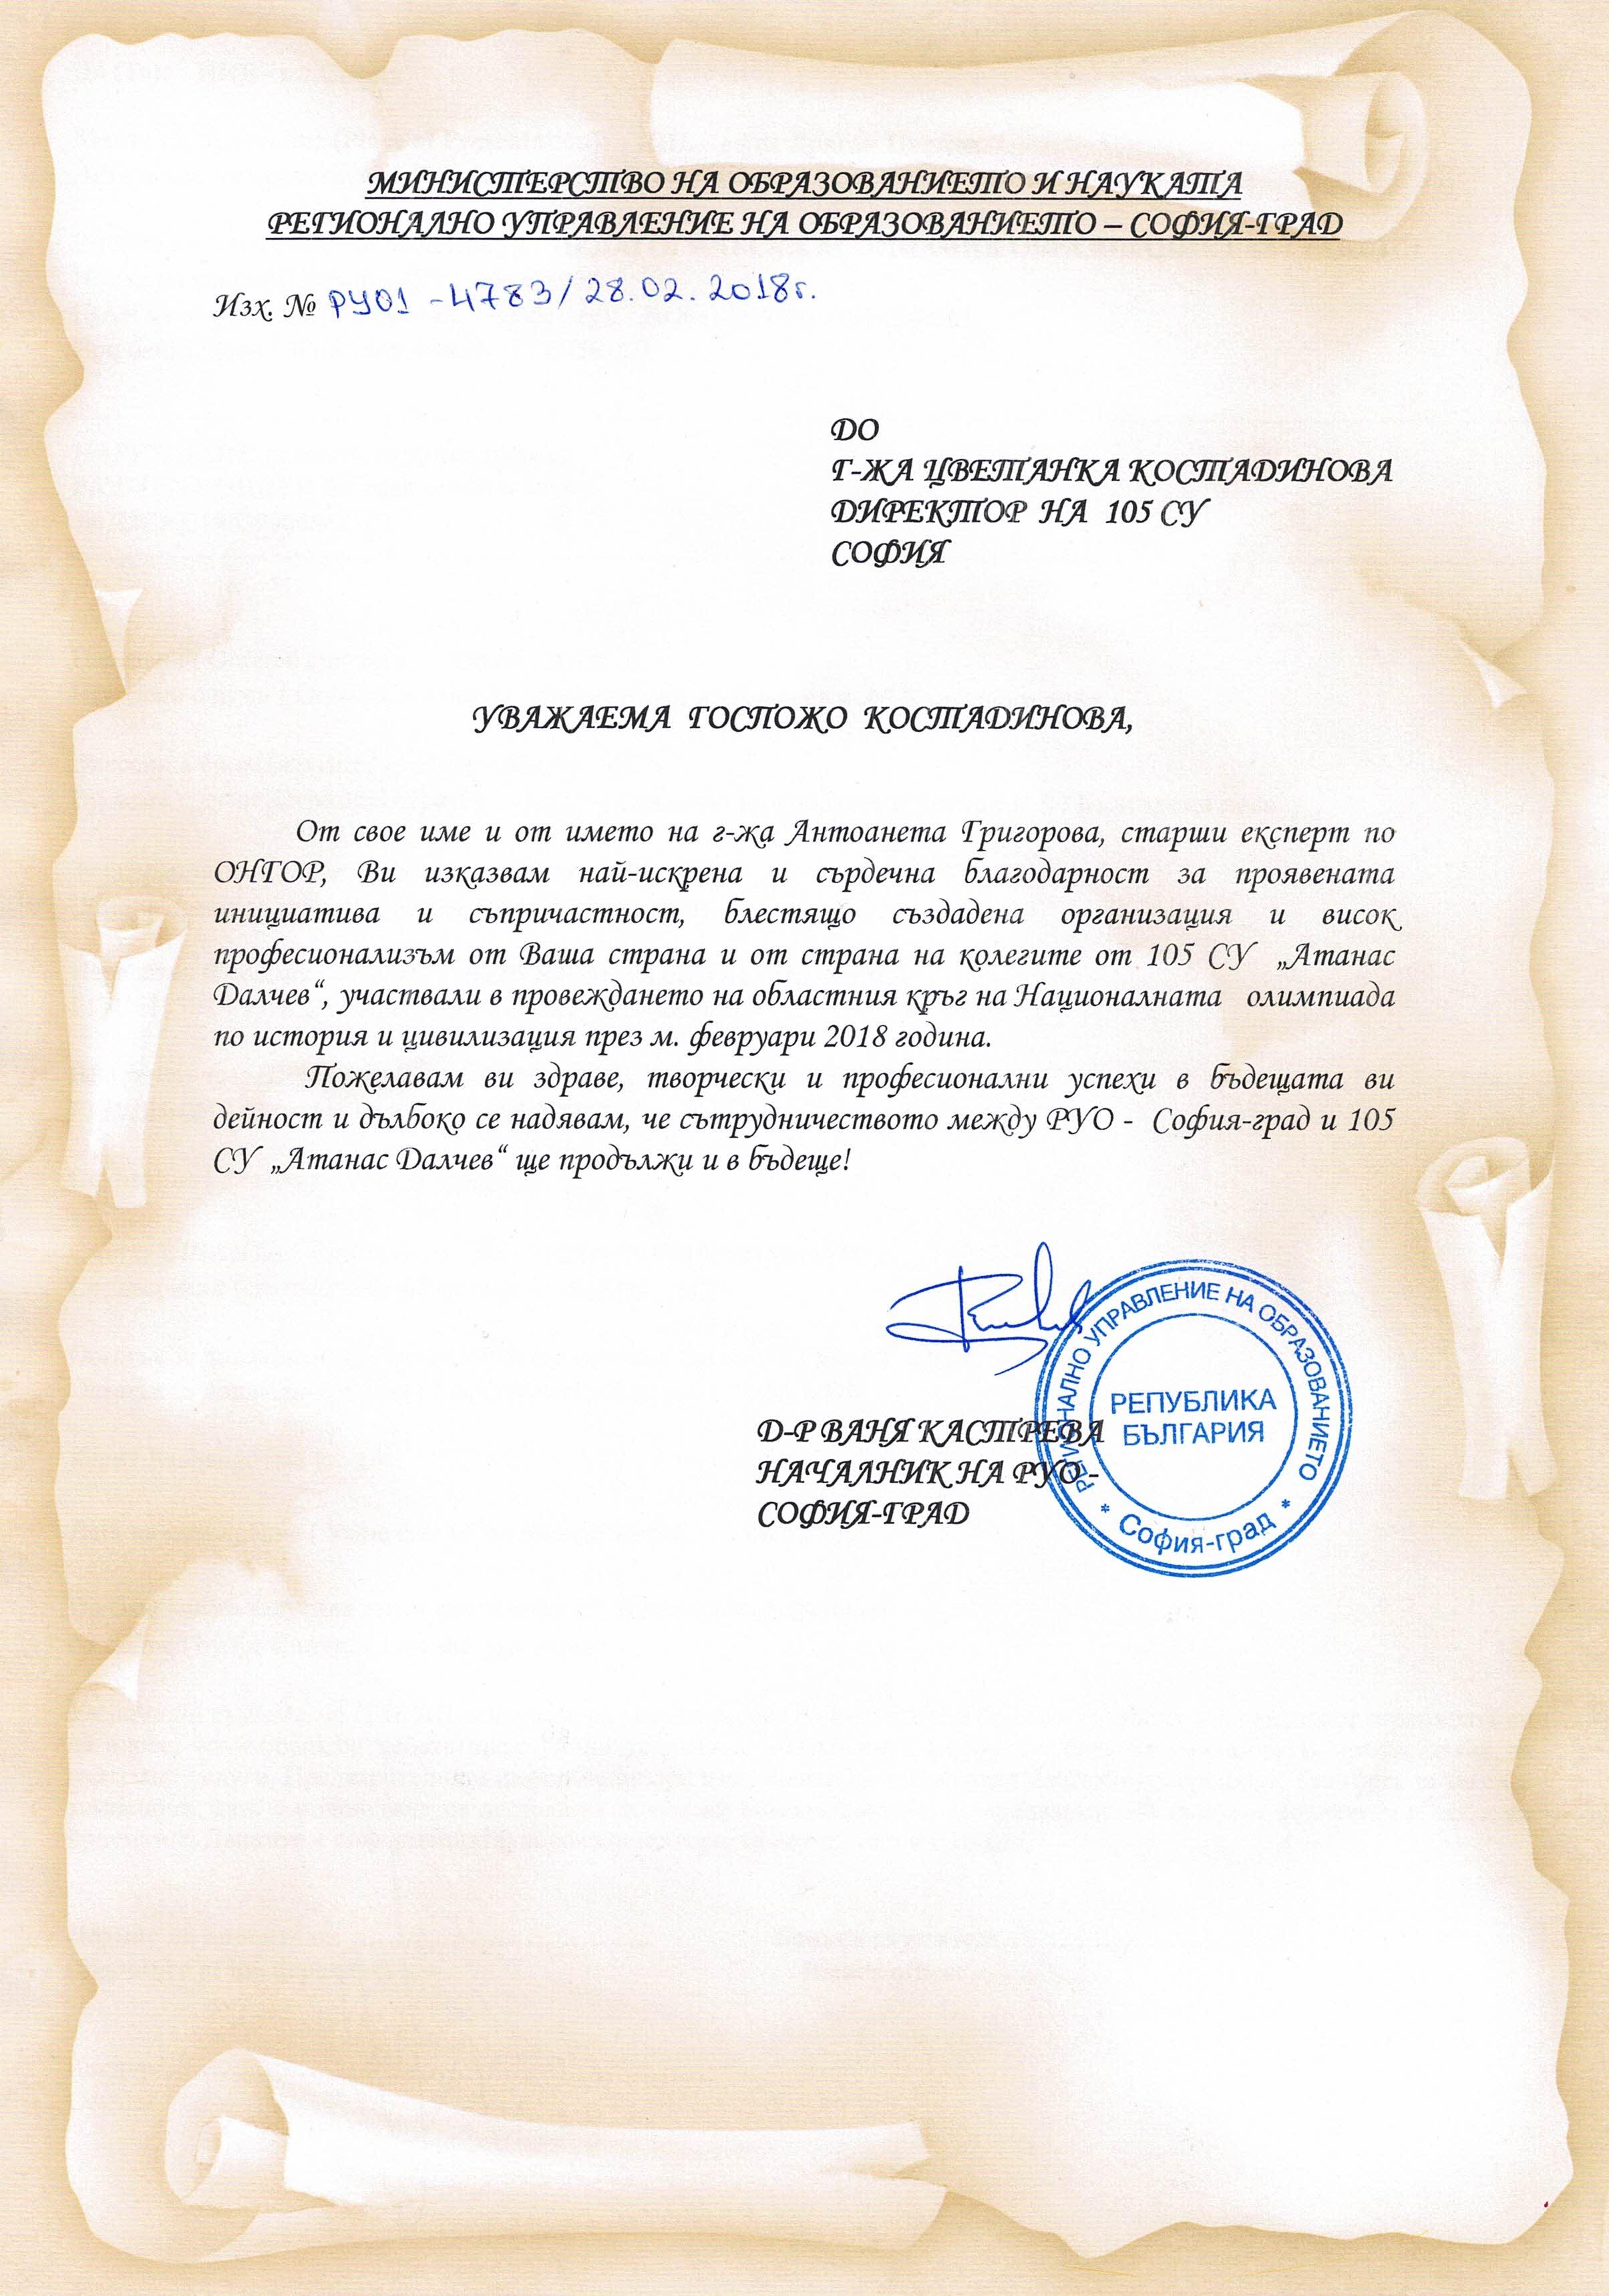 kostadinova_1(2)